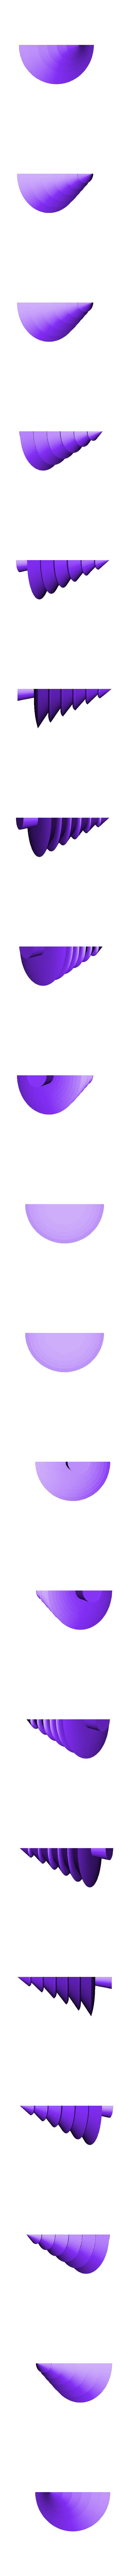 6 pointed tree curve (half).stl Download STL file christmas pack • 3D printer model, sebastiandavidsalas